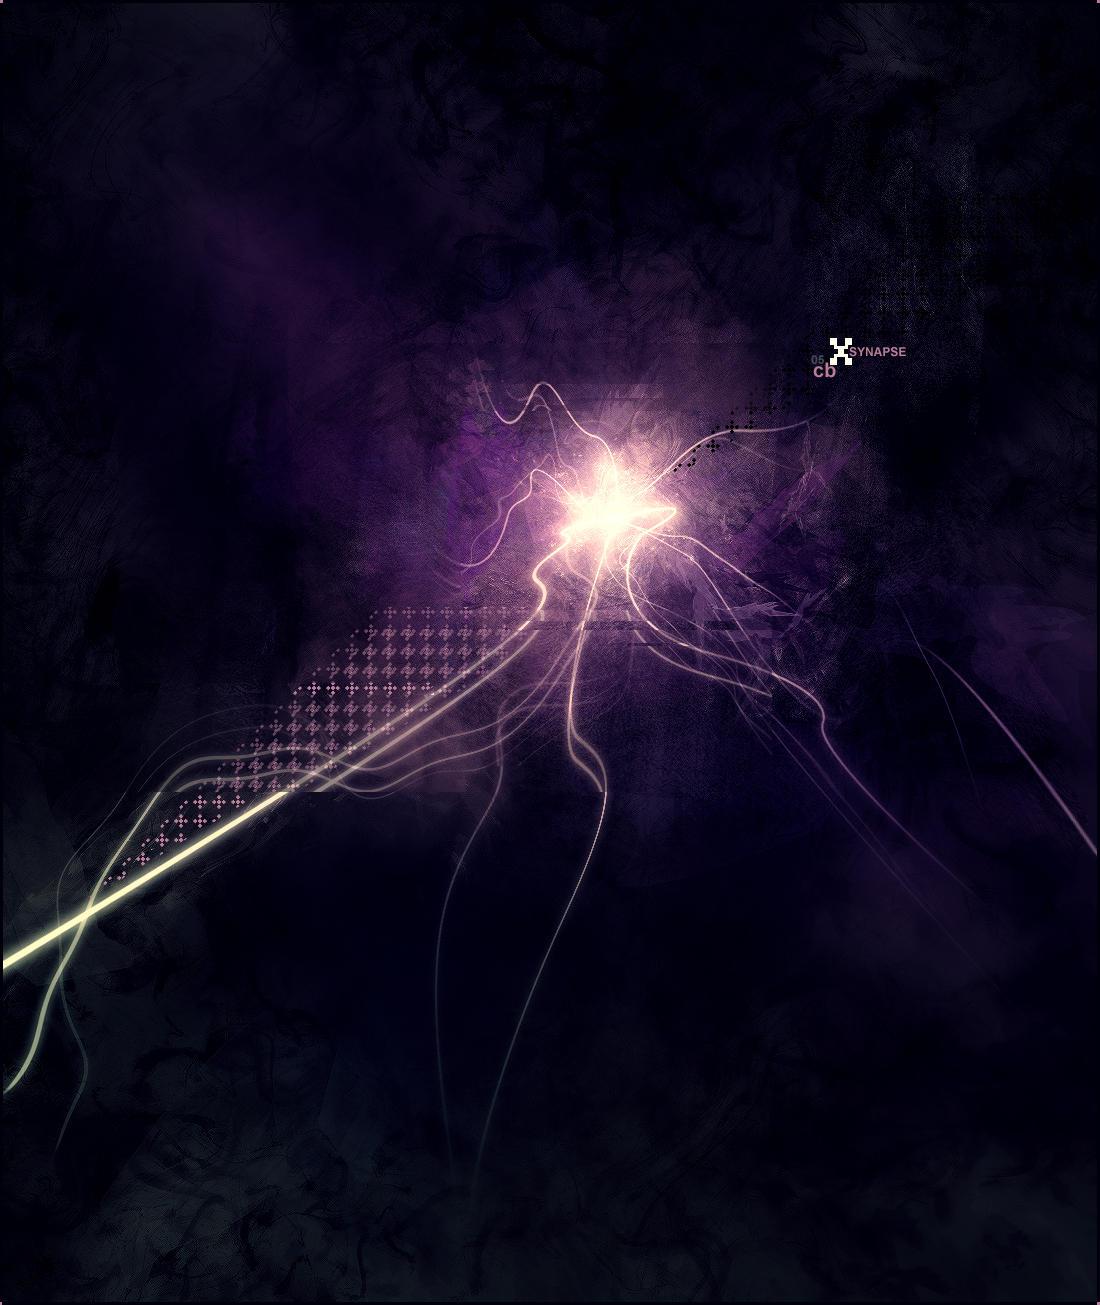 synapse wallpaper download - photo #17